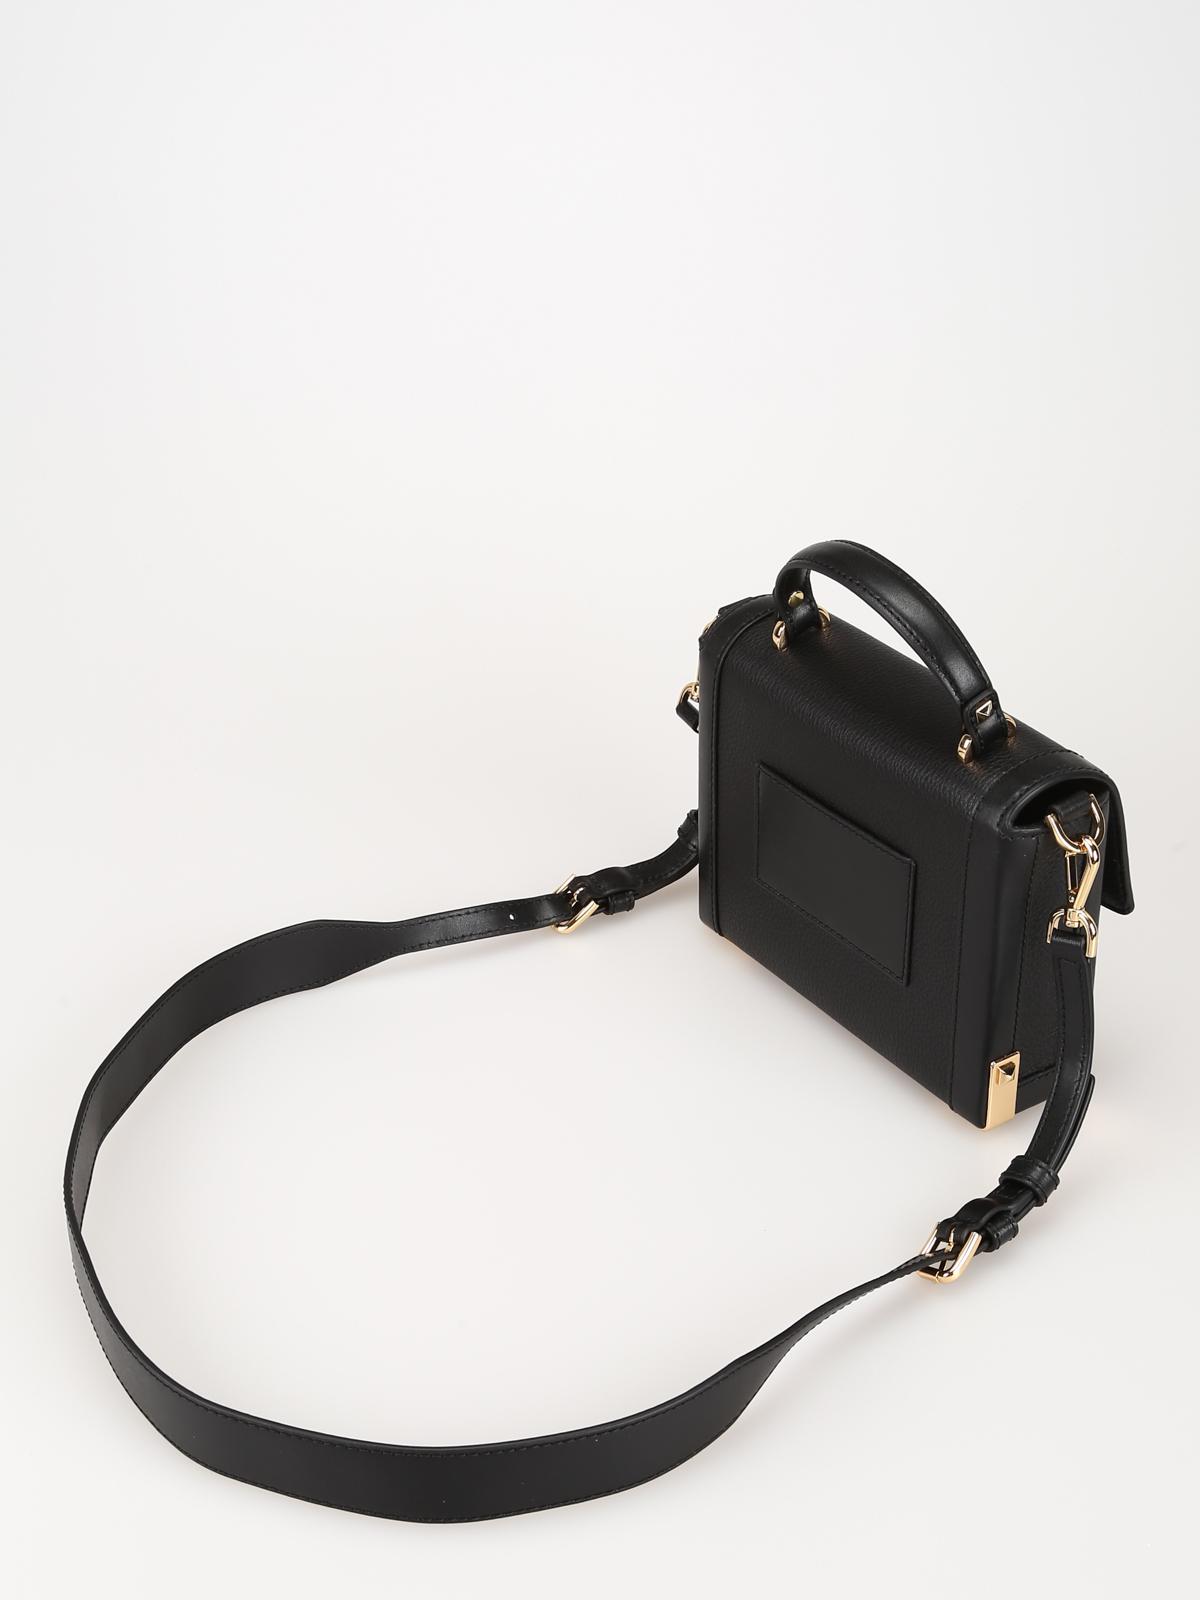 da260be6671 iKRIX MICHAEL KORS: cross body bags - Jayne black leather small trunk bag